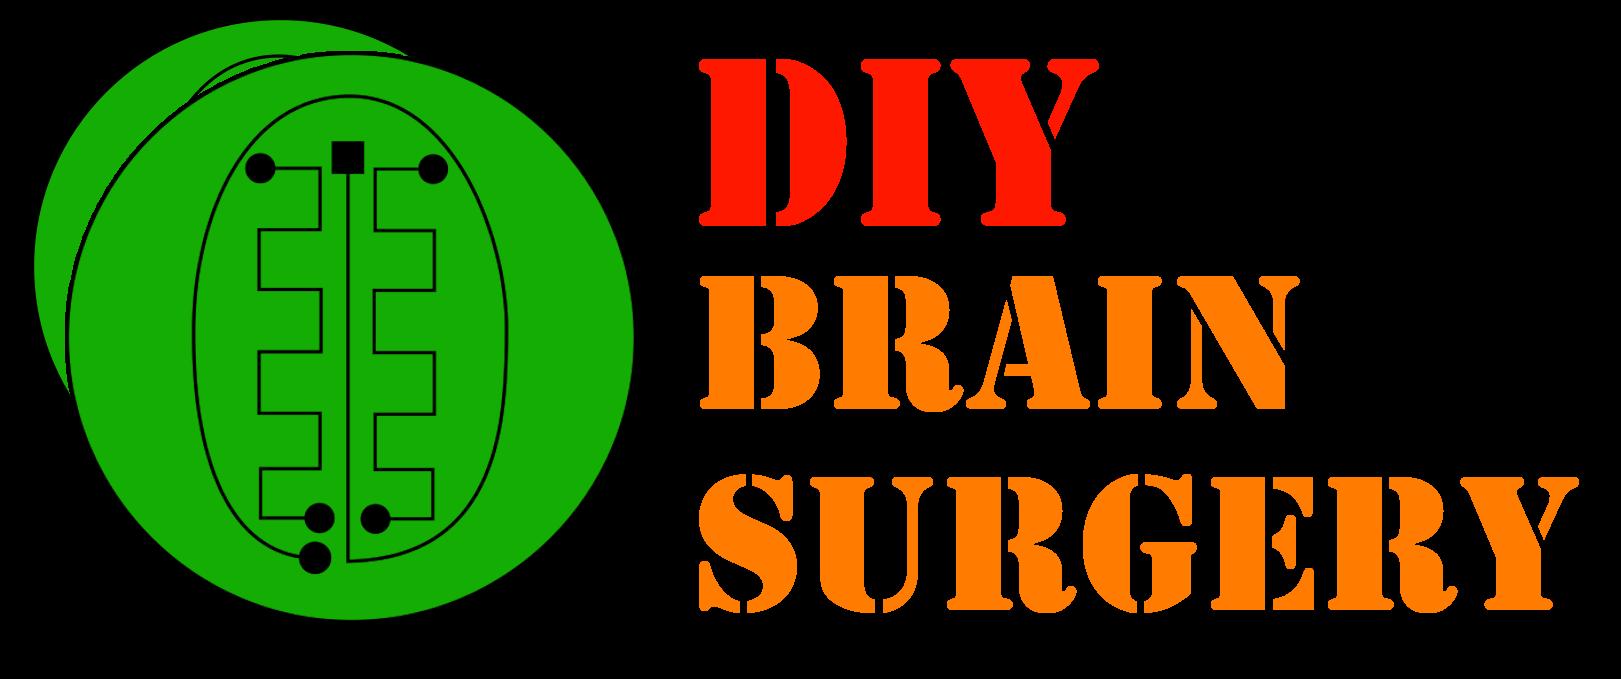 DIY Brain Surgery